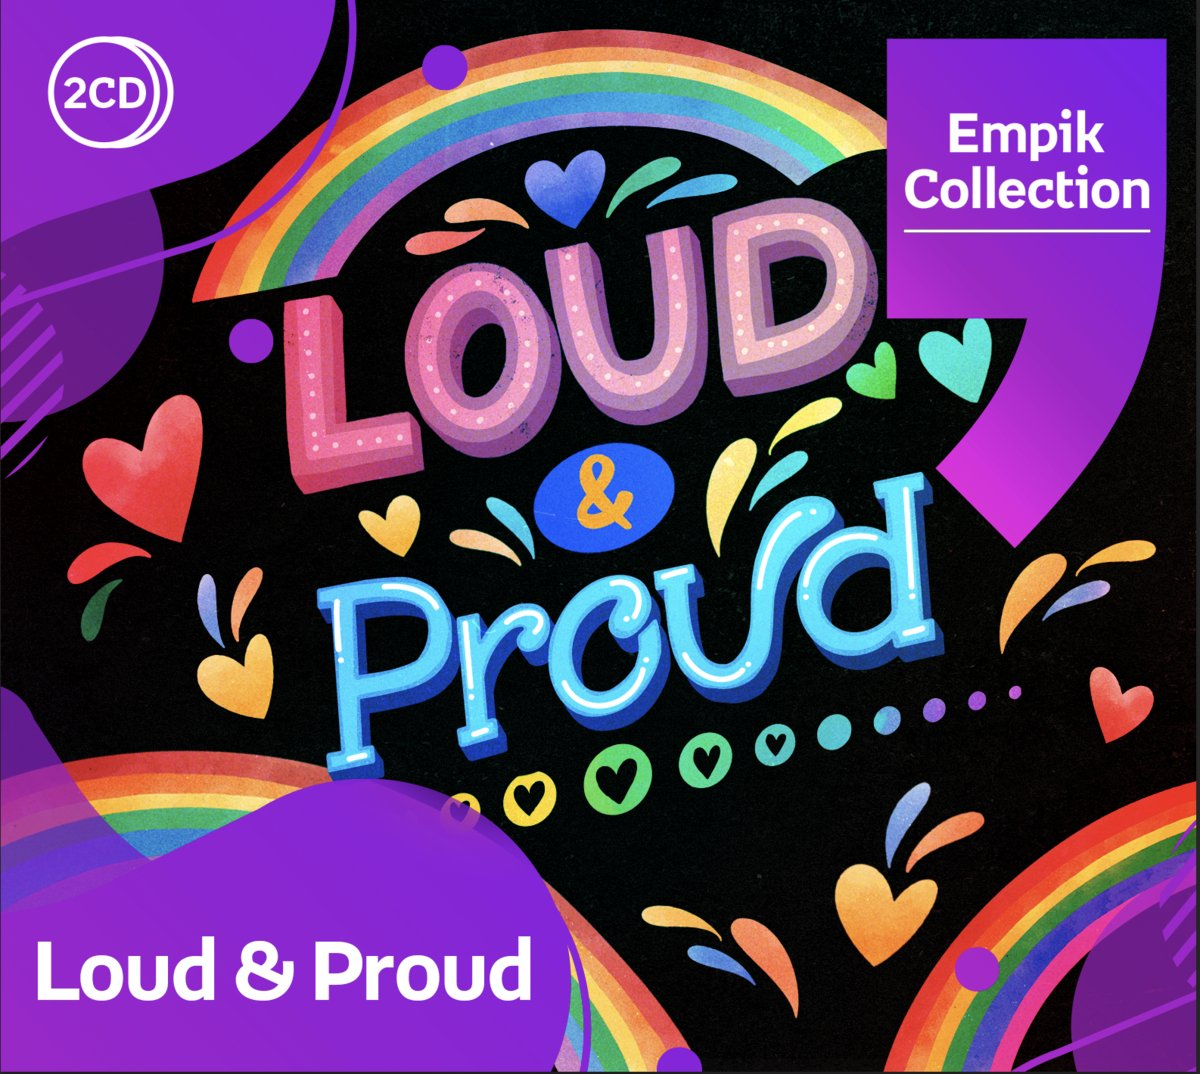 Empik Collection. Loud & Proud